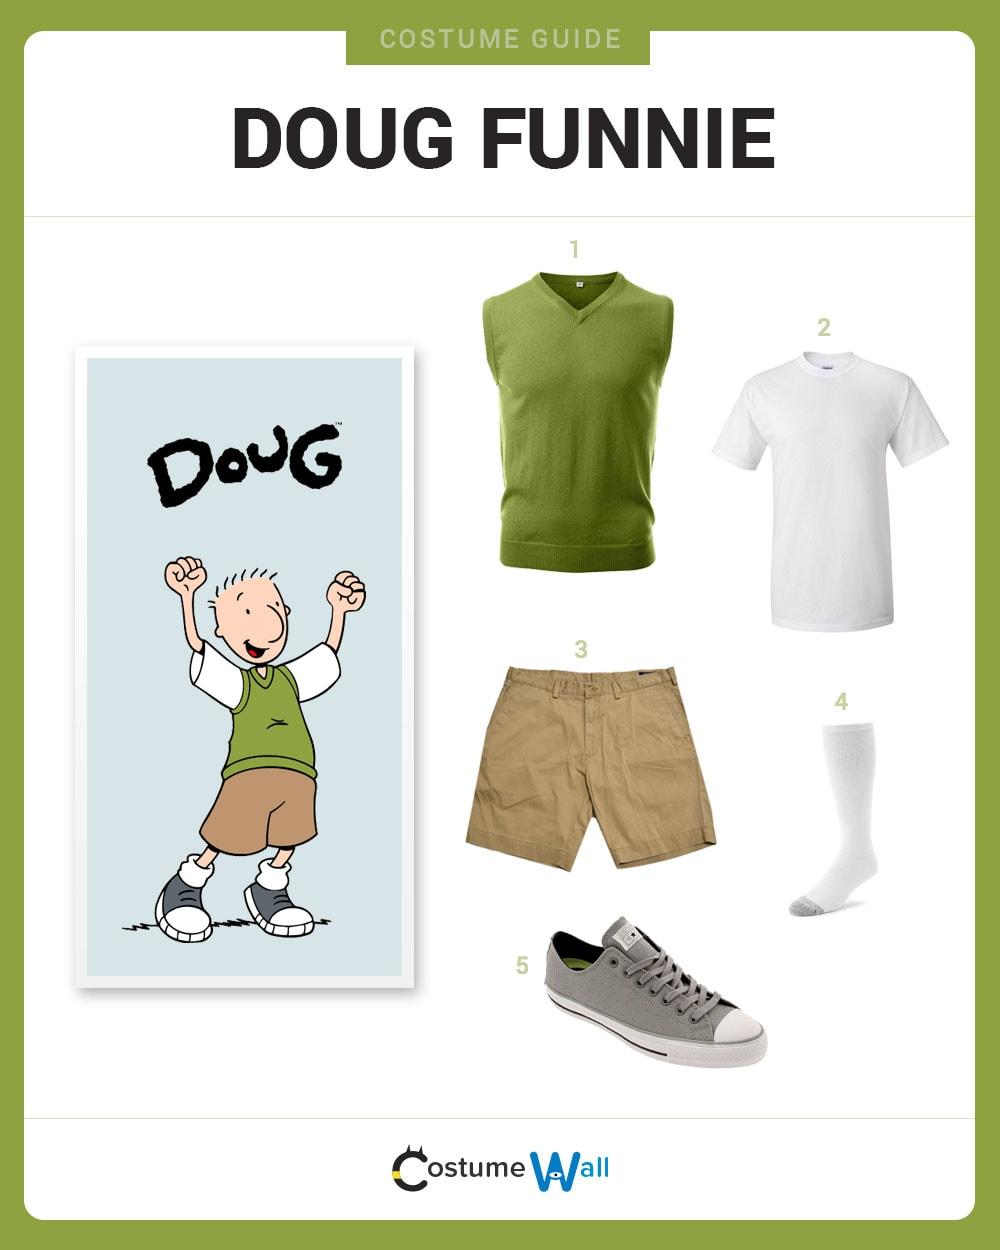 Dress Like Doug Funnie Costume DIY Outfit | Costume Wall Quailman Doug Funnie